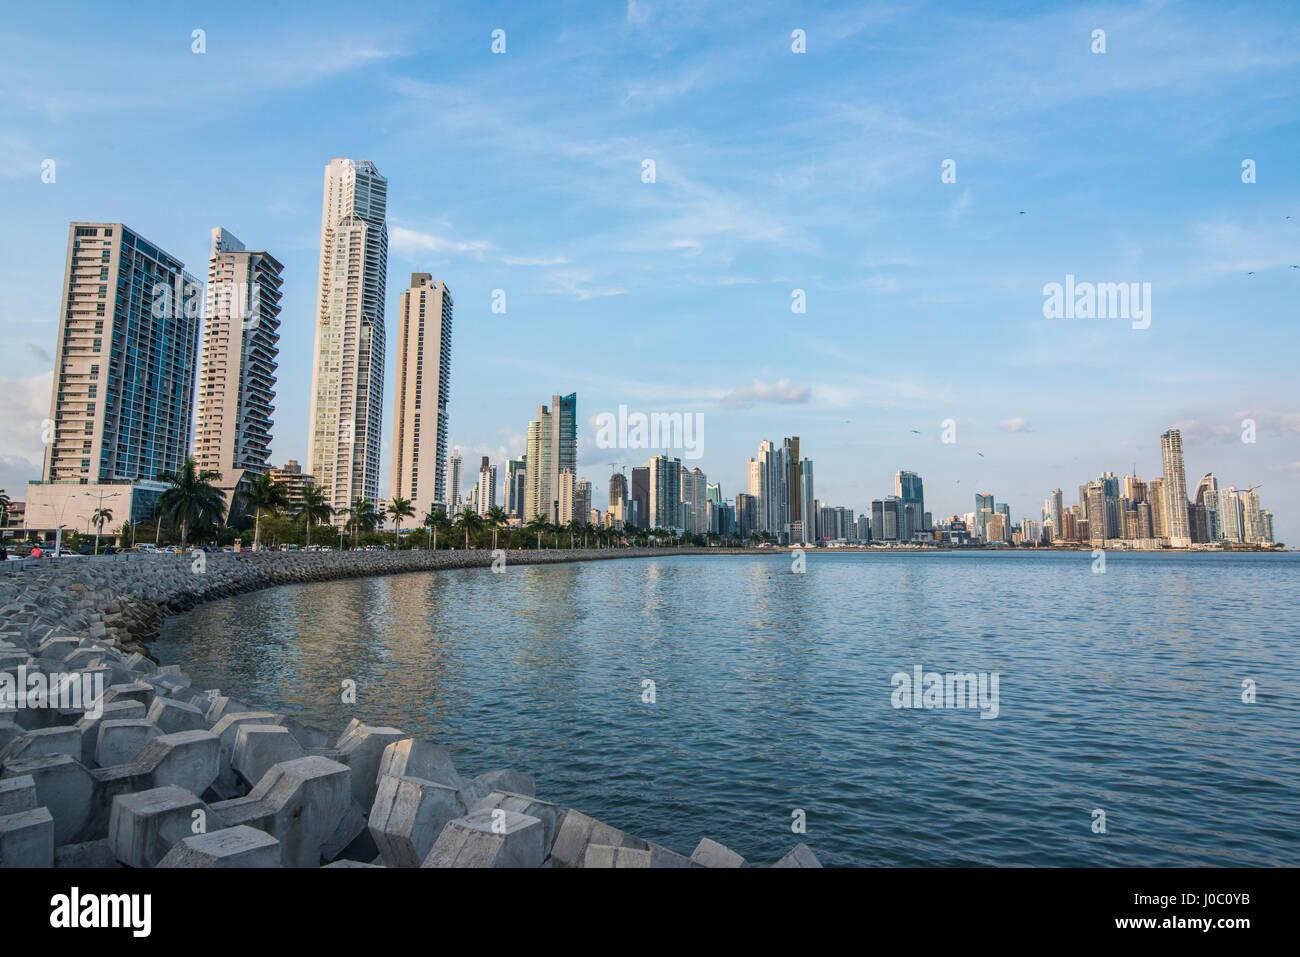 Skyline von Panama City, Panama, Mittelamerika Stockbild